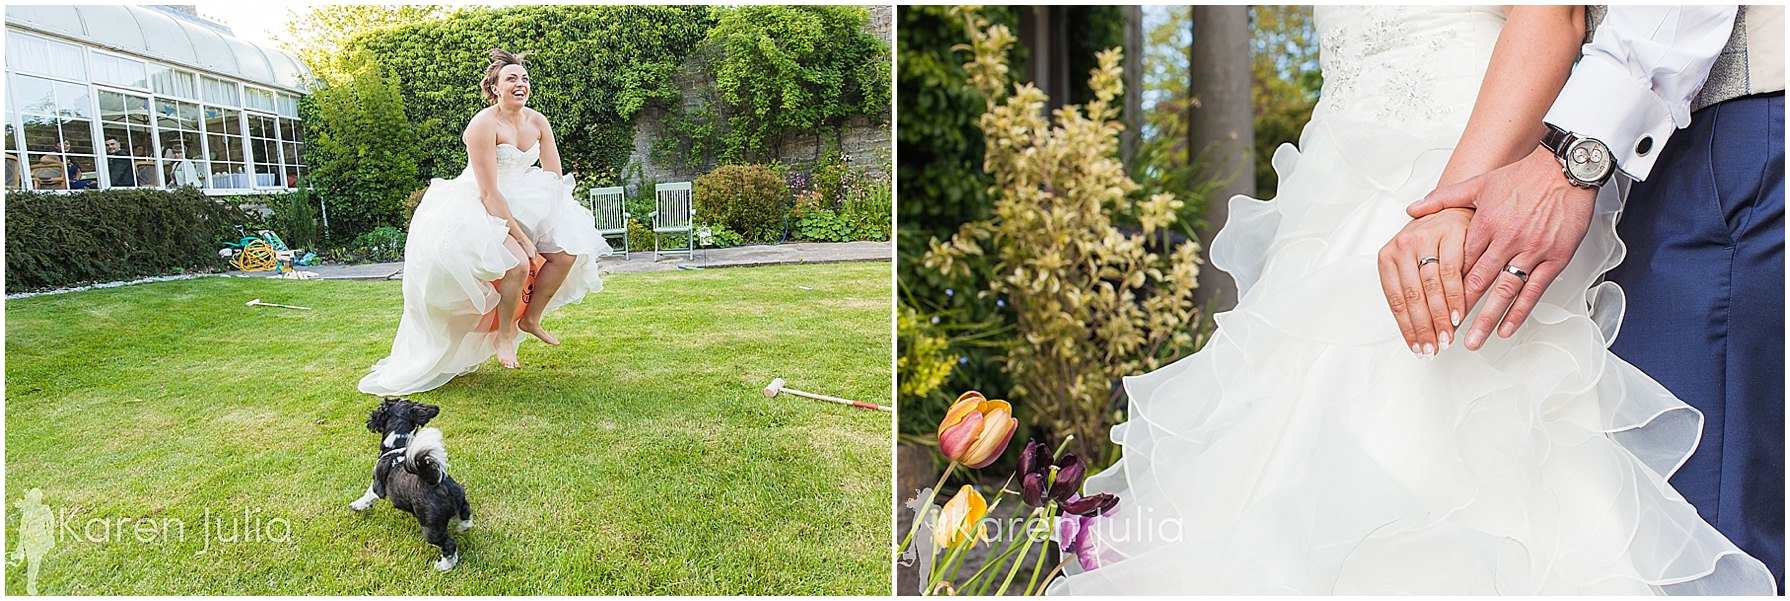 Spring-House-Hotel-Wedding-Photography-28